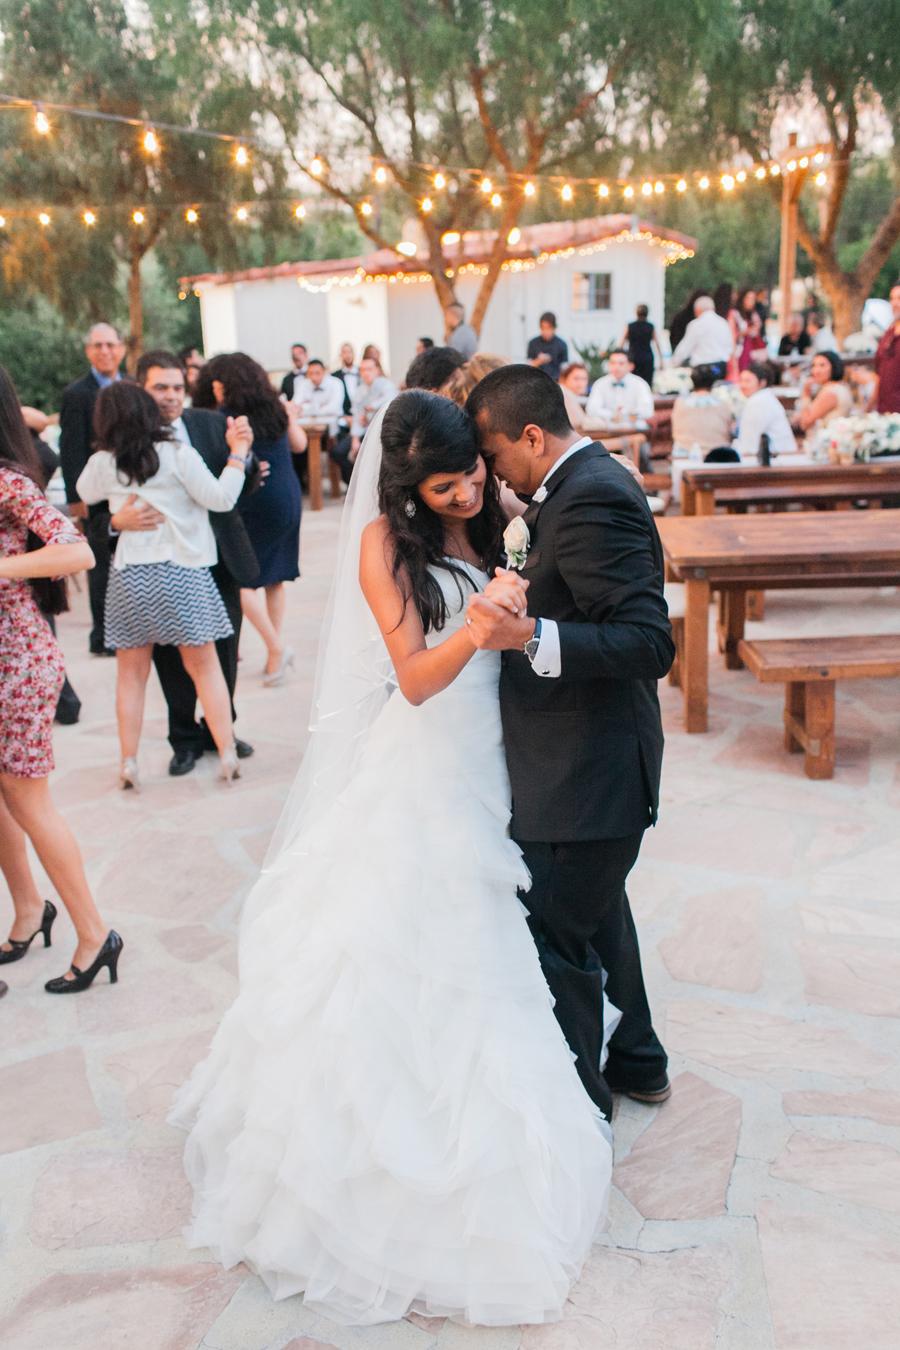 artistrie-co-best-wedding-photos-2015-023